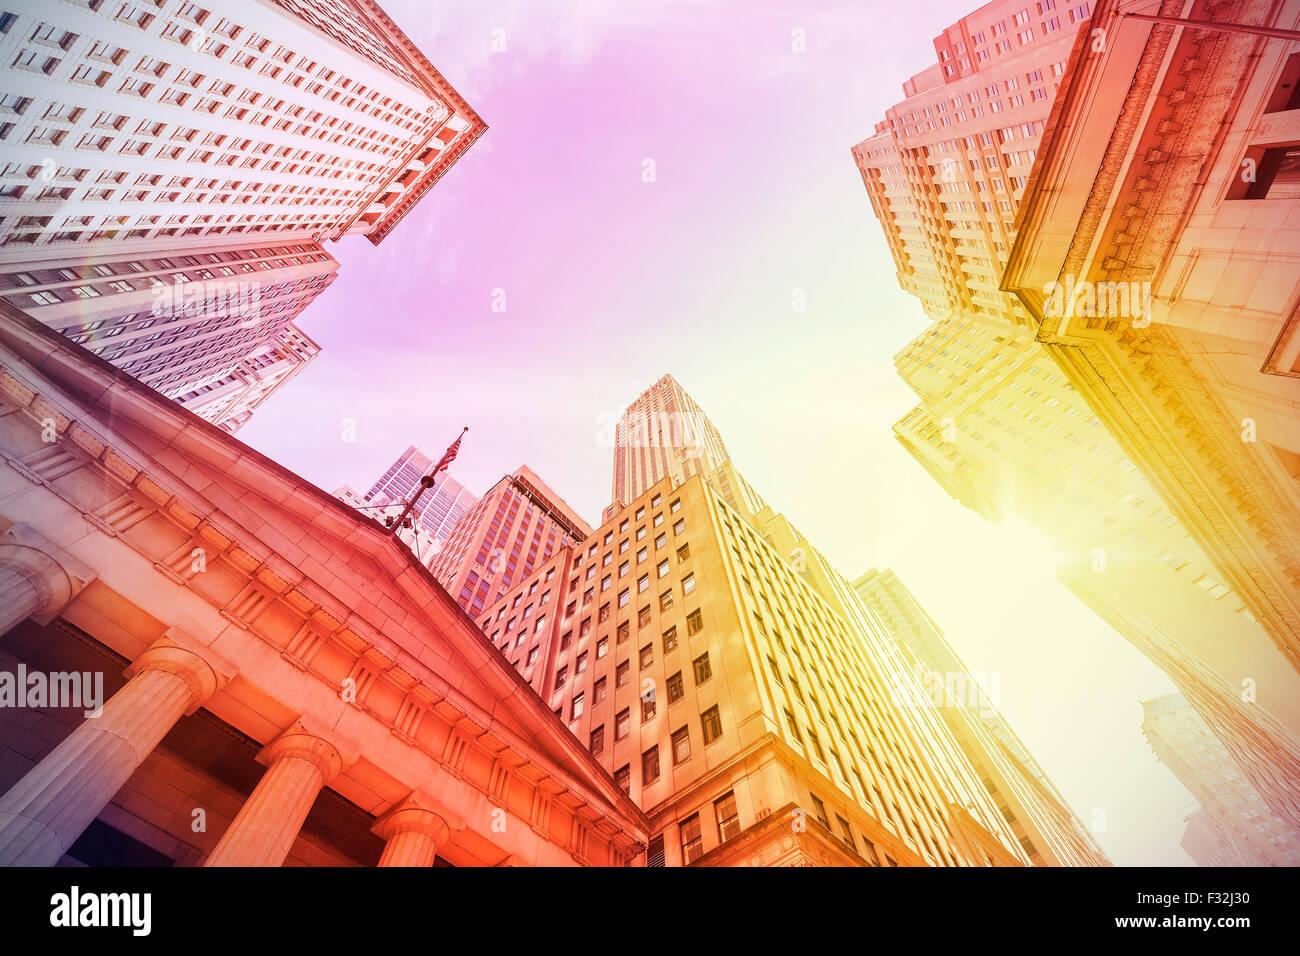 Vintage instagram filtered Wall Street at sunset, Manhattan, New York City, USA. - Stock Image